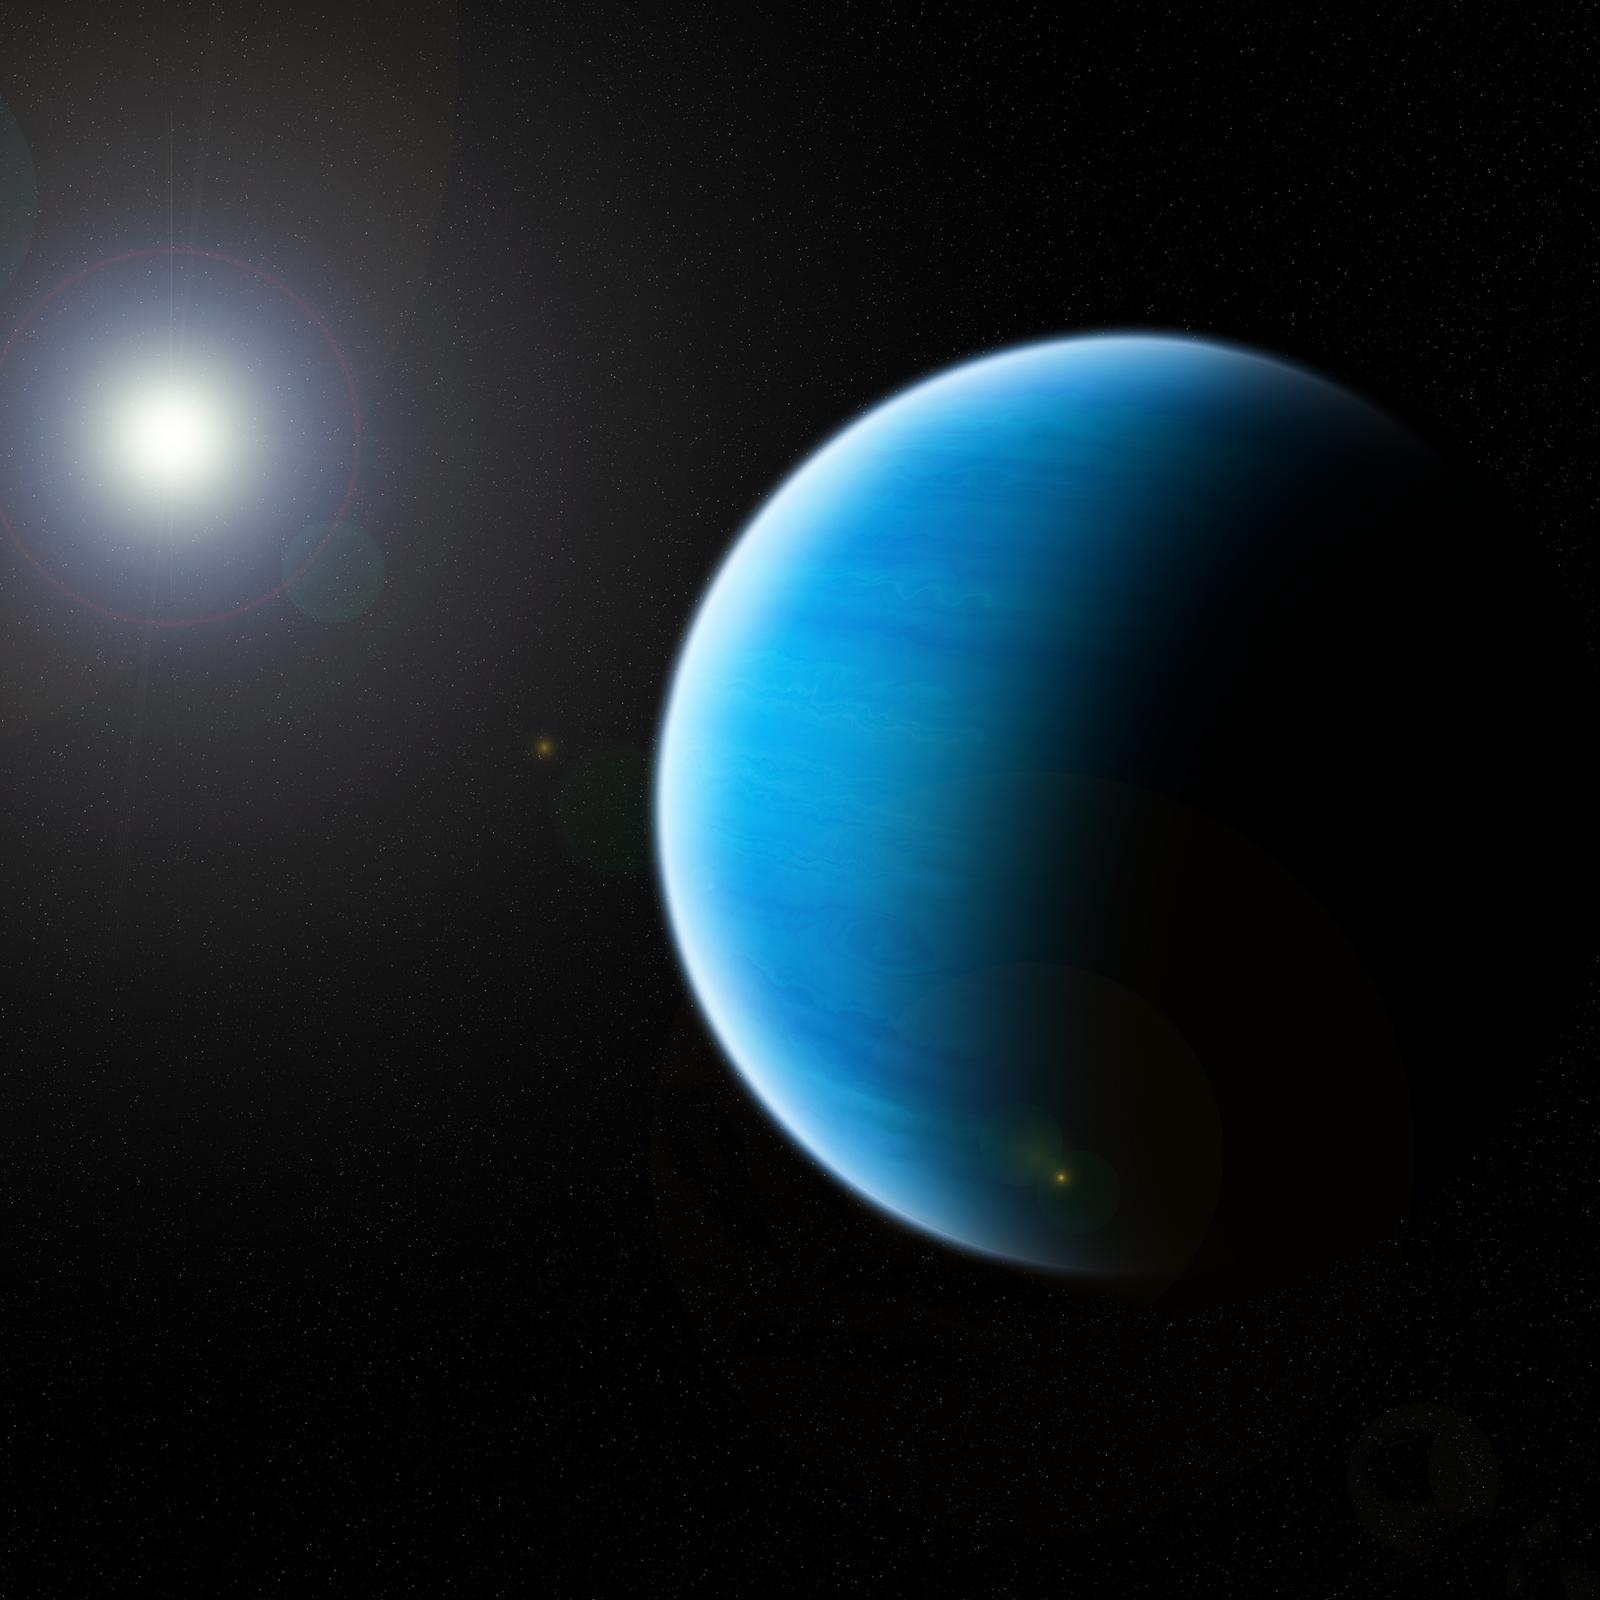 planet art uranus - photo #9